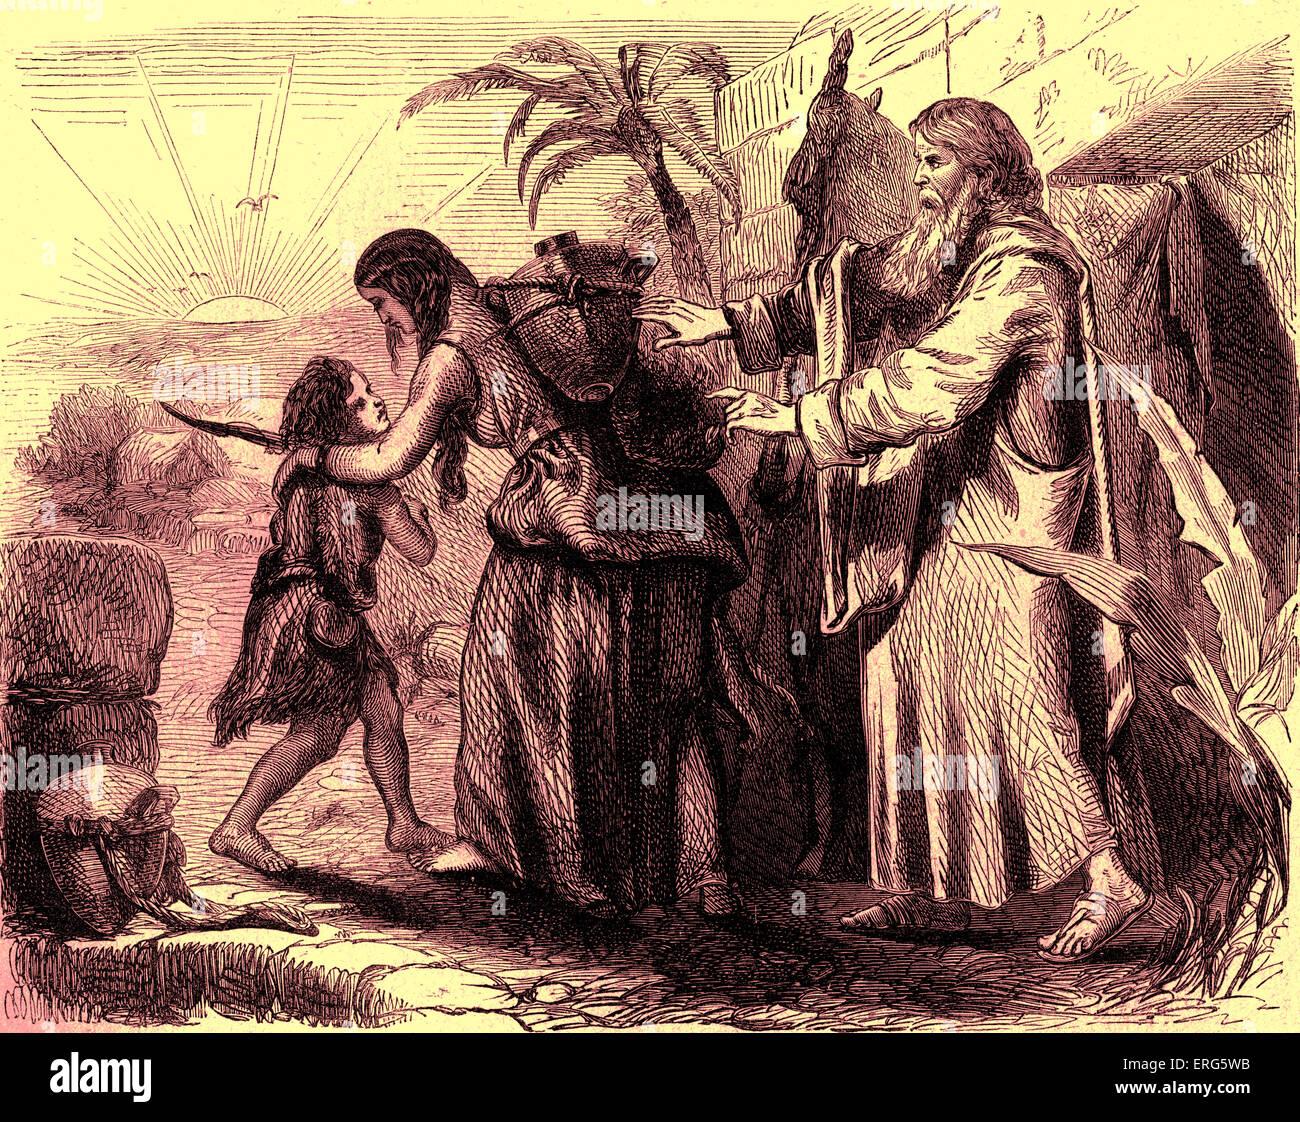 Hagar and Ishmael sent away by Abraham fulfilling Sarah 's wish. Splitting of Judaism (descendands of Isaac) - Stock Image